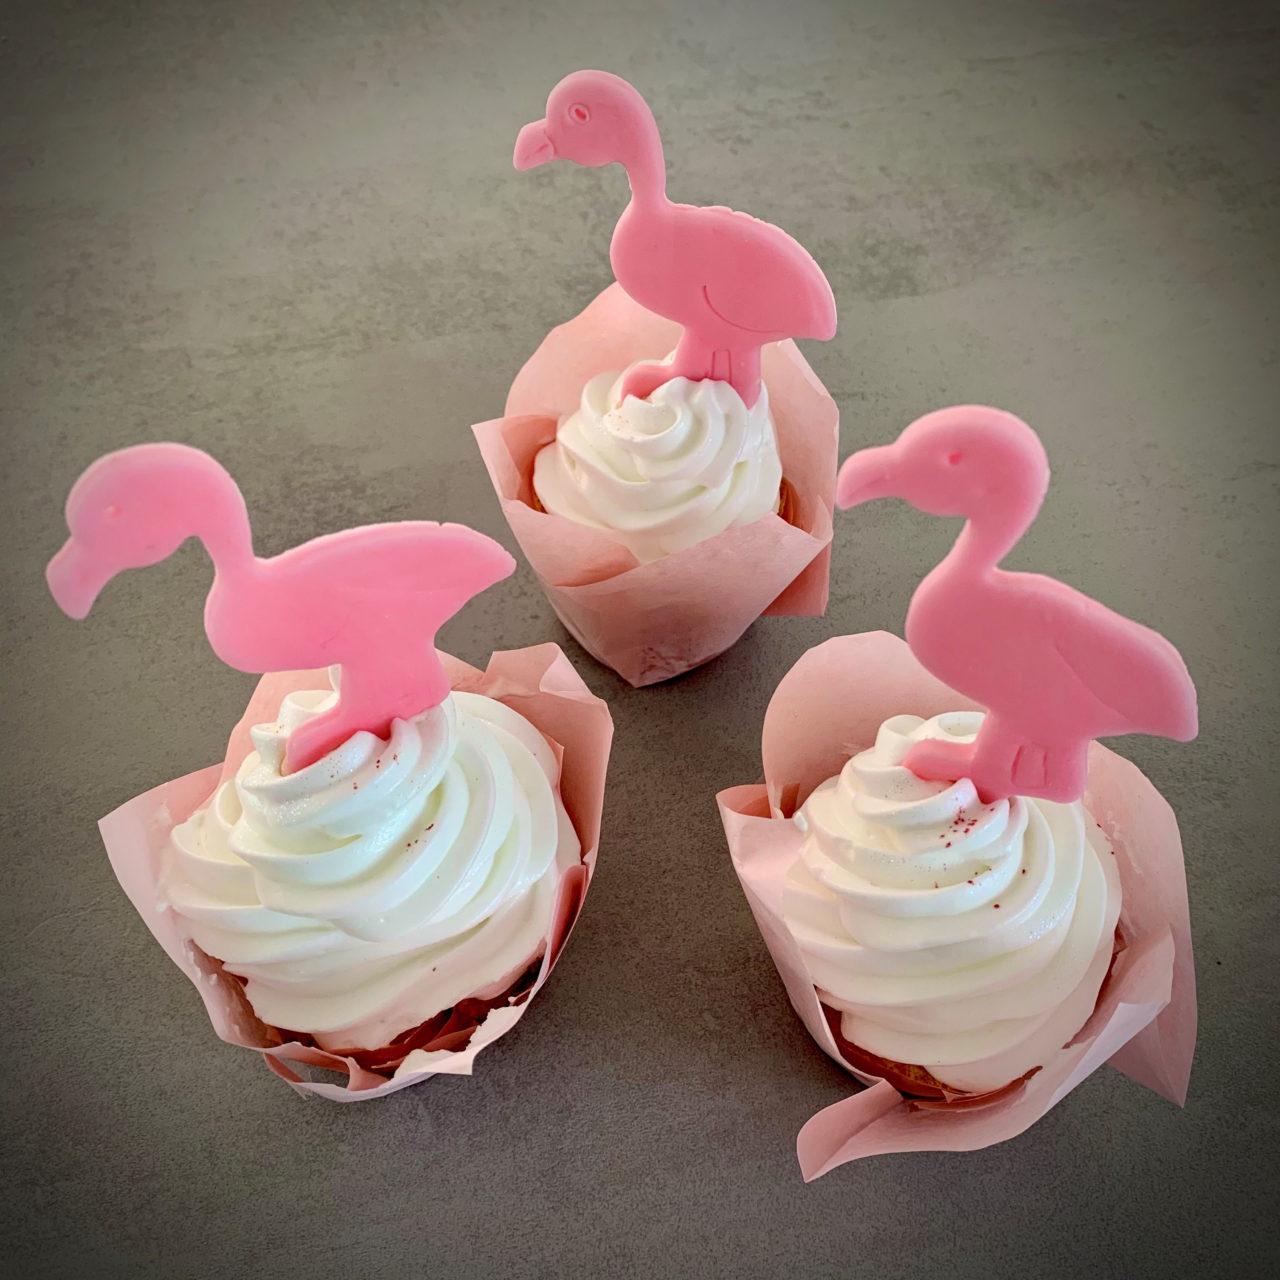 Köln Beste Leckerchen Flamingo Cupcakes 2